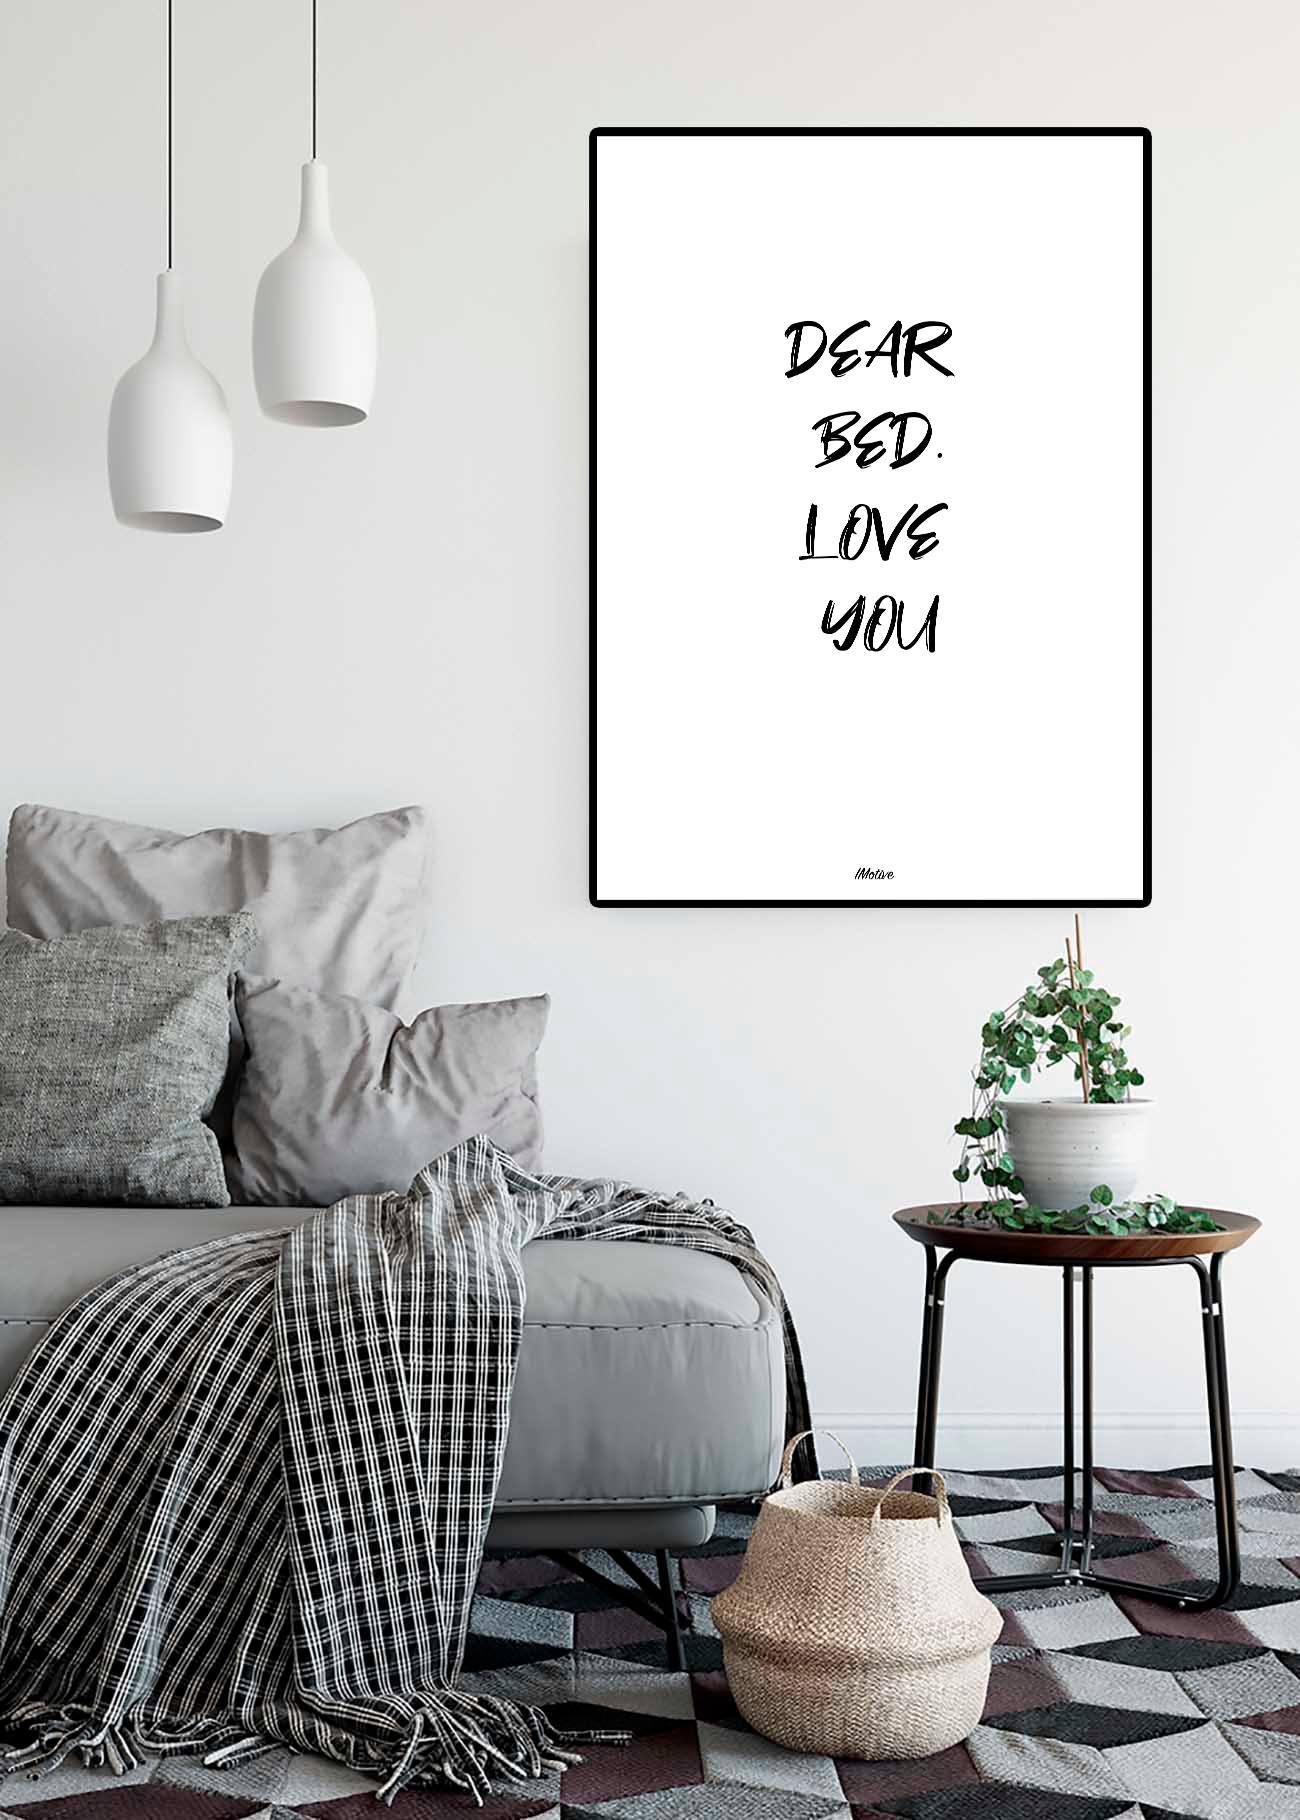 Dear bed